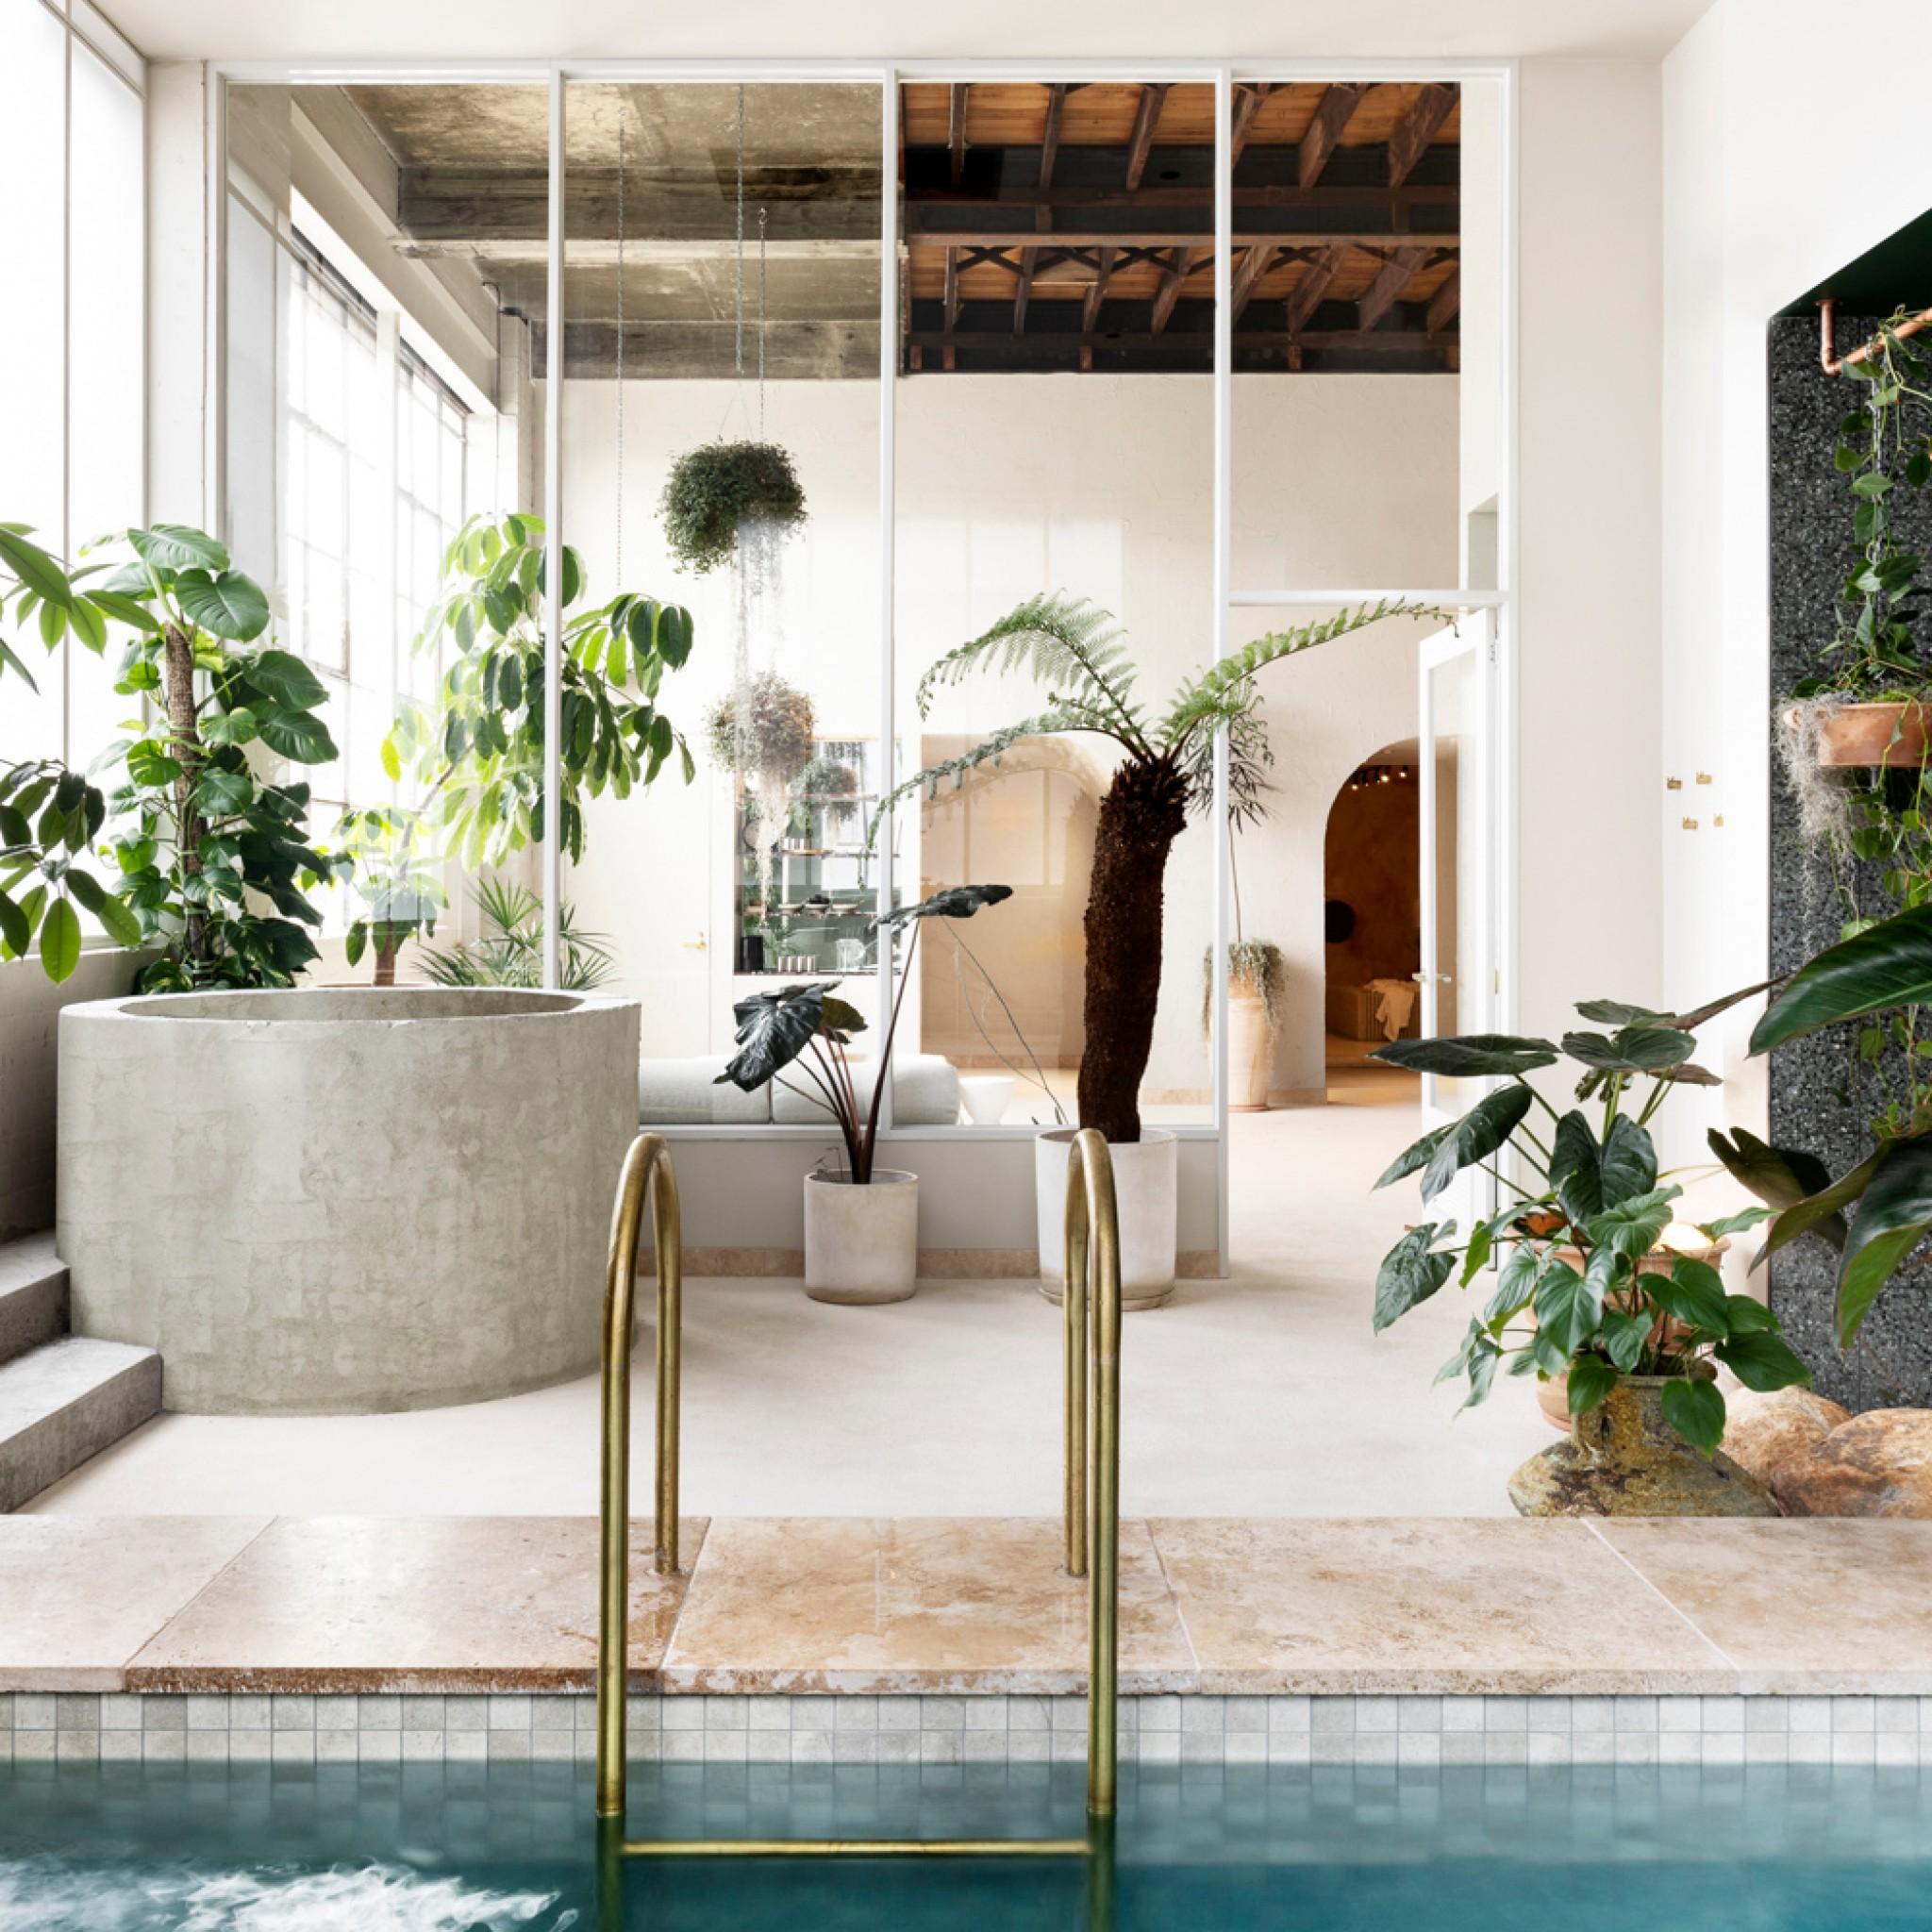 Sense of Self Bathhouse and Spa by S.O.S Sense Of Self